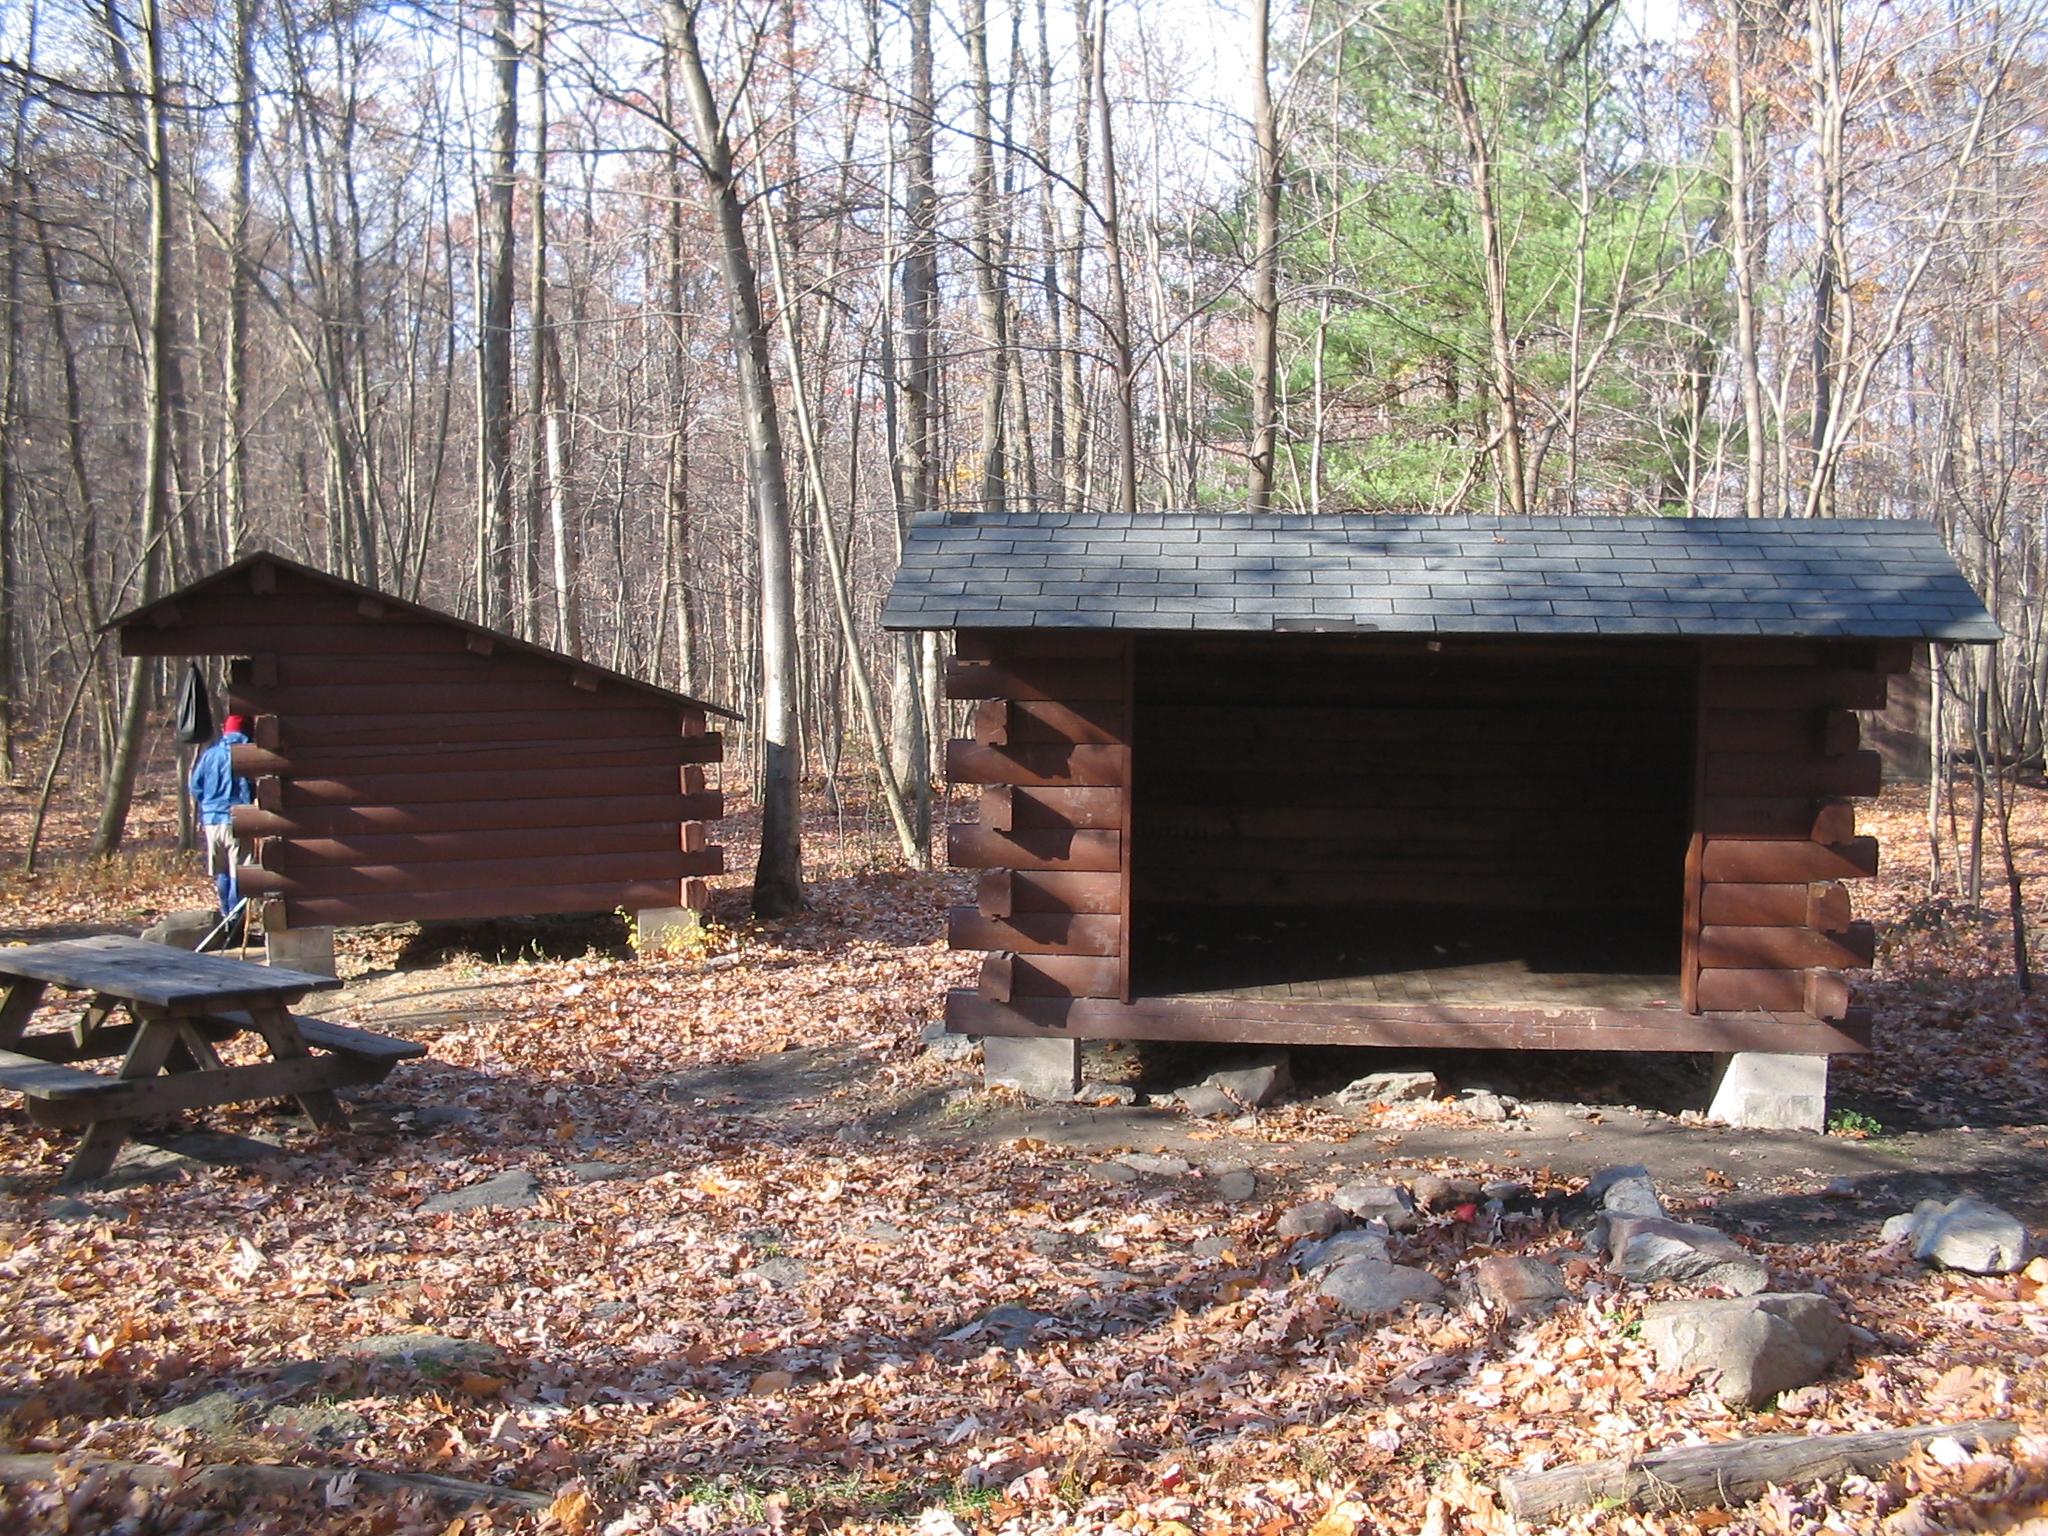 On deer trail appalachian shelter lick